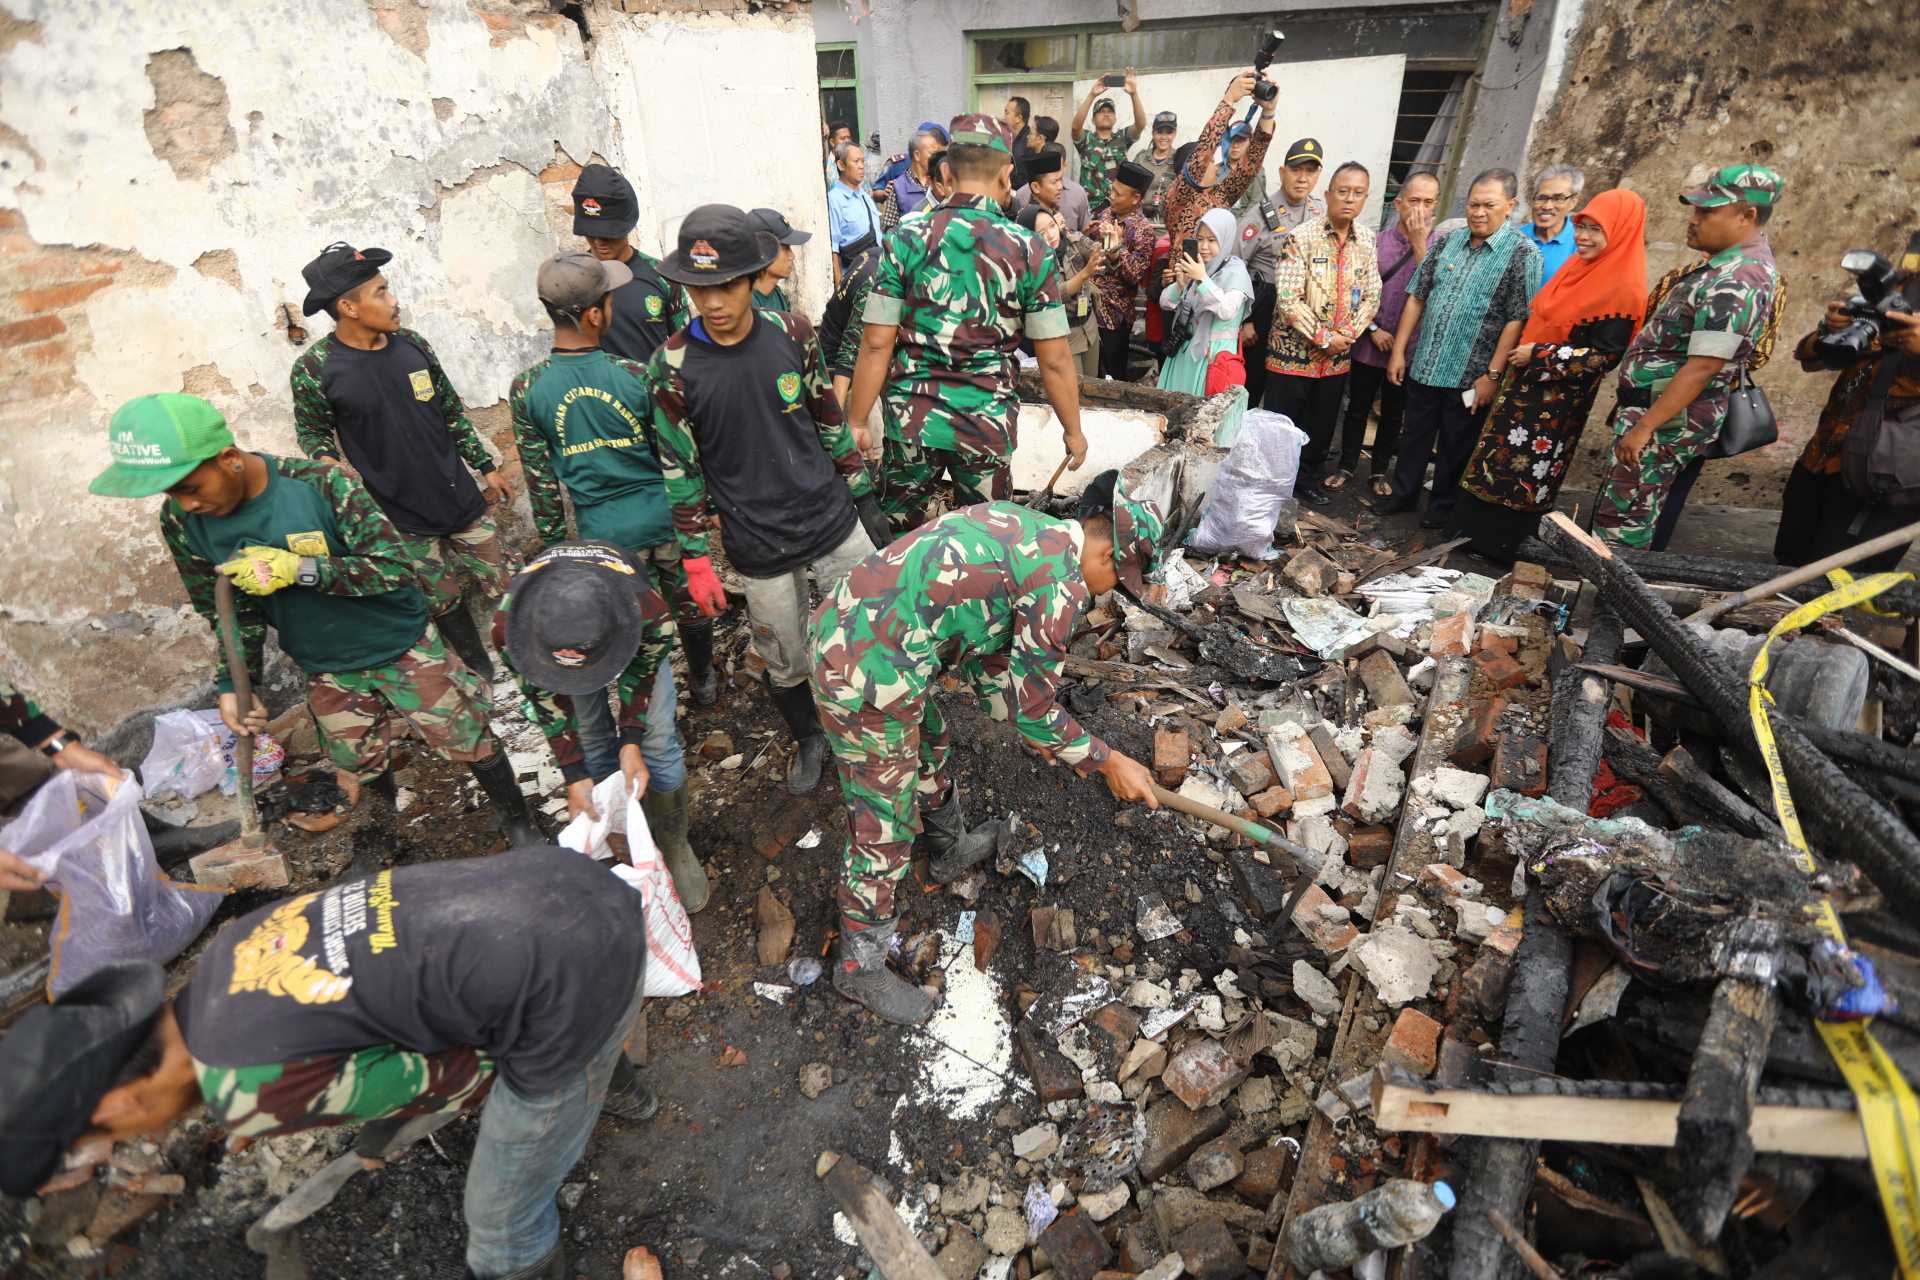 Korban Kebakaran Kelurahan Nyengseret Kota Bandung Harapakan Bantuan